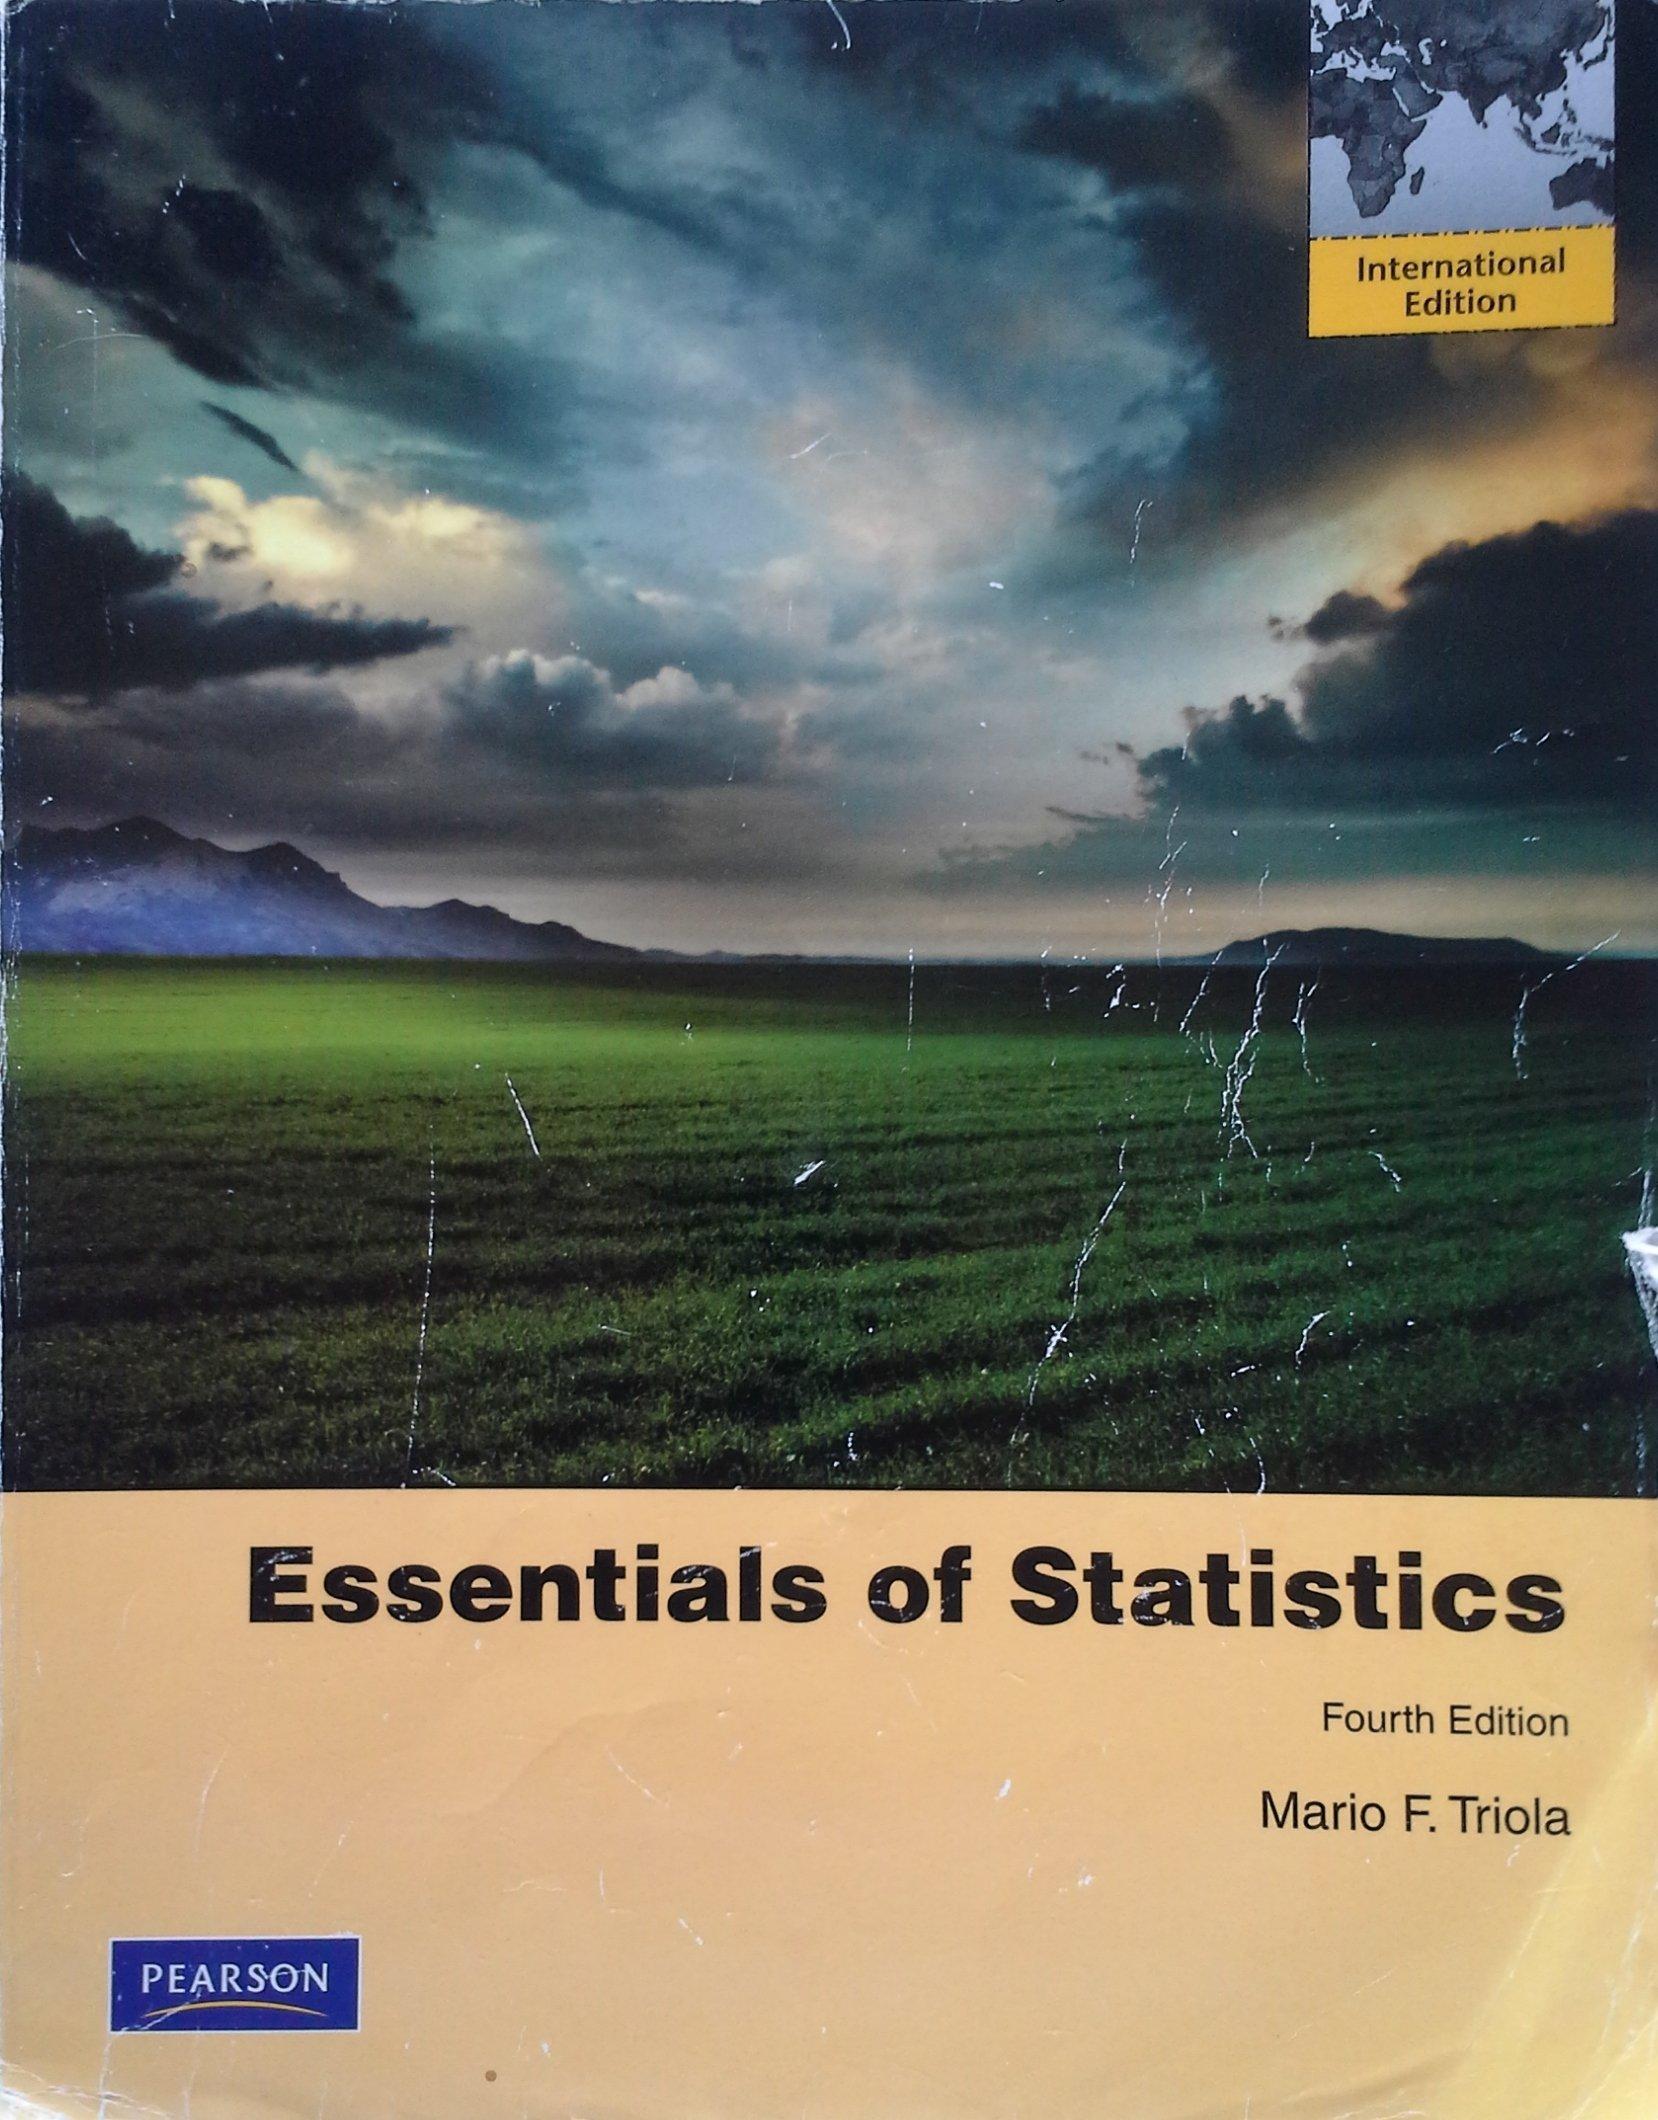 Essentials of statistics 4th edition | ebay.